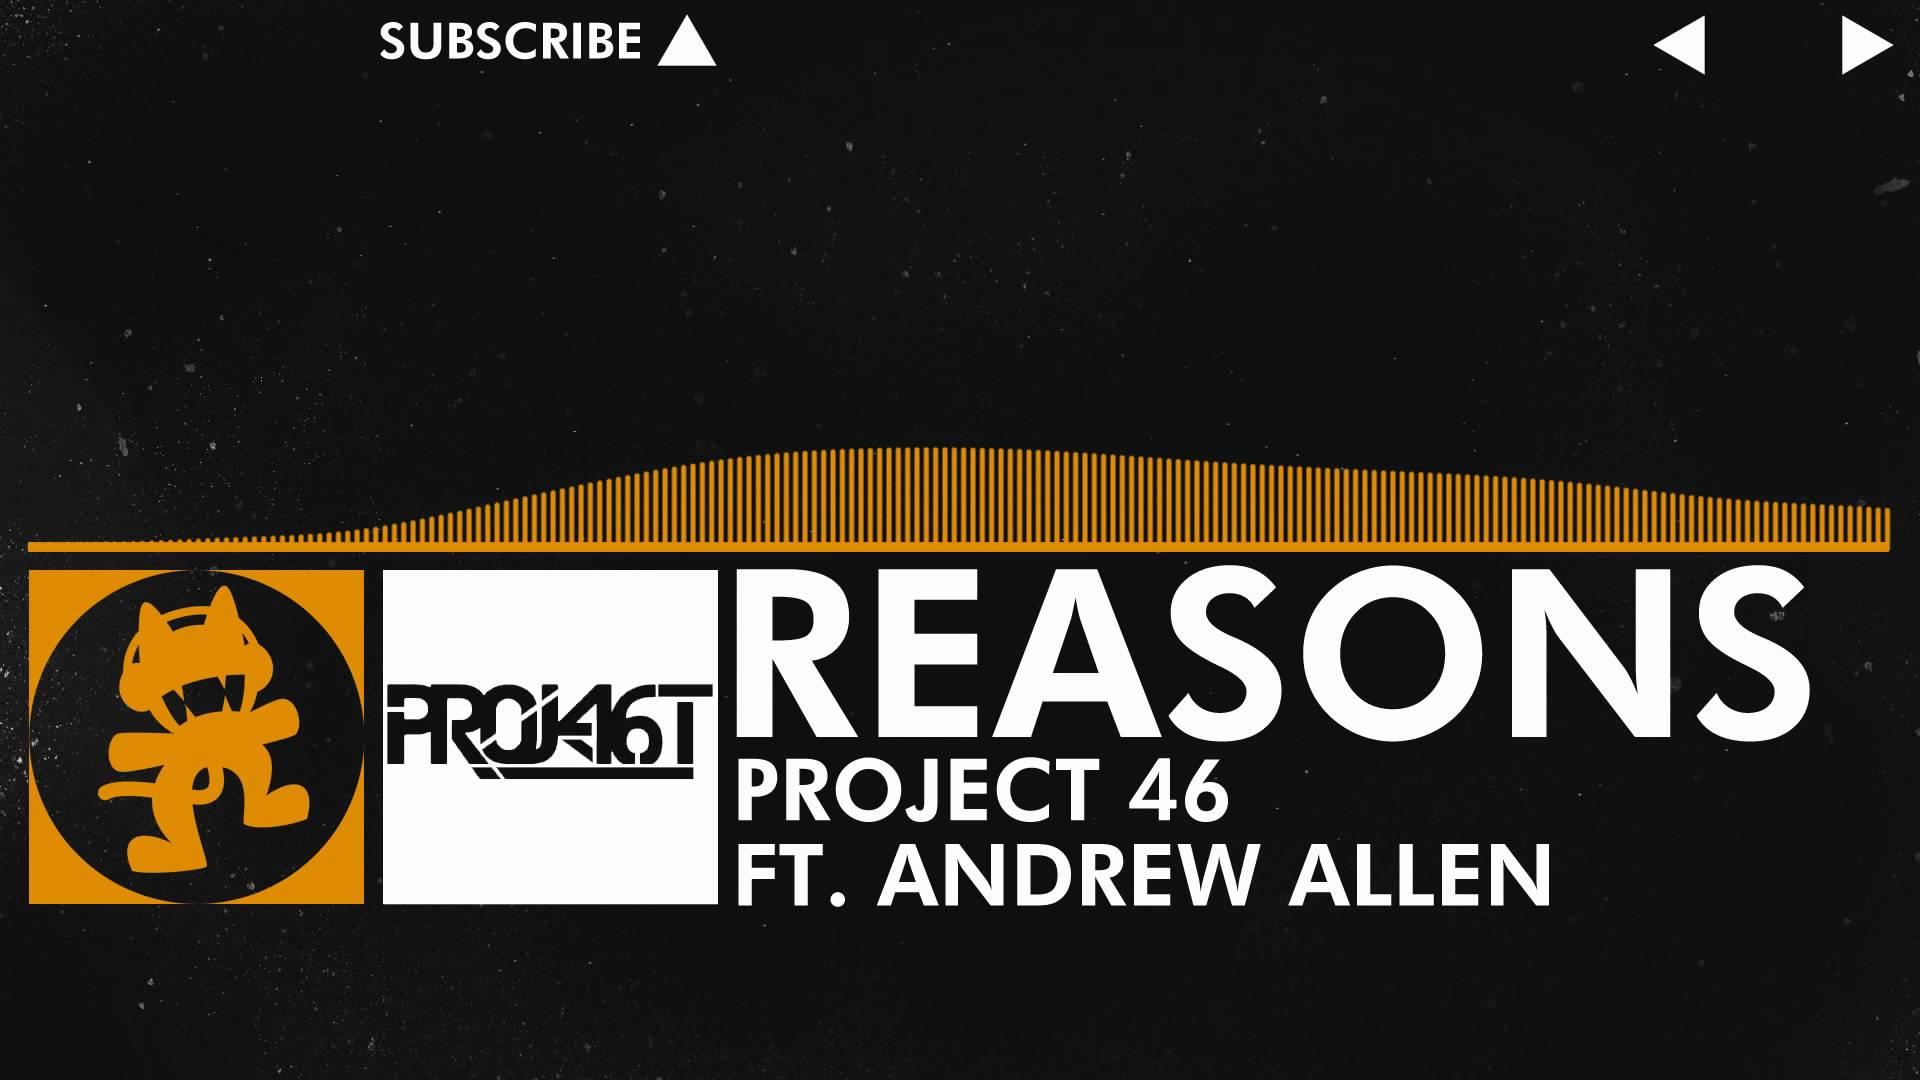 [Progressive House] - Project 46 - Reasons (feat. Andrew Allen) [Monstercat Release]